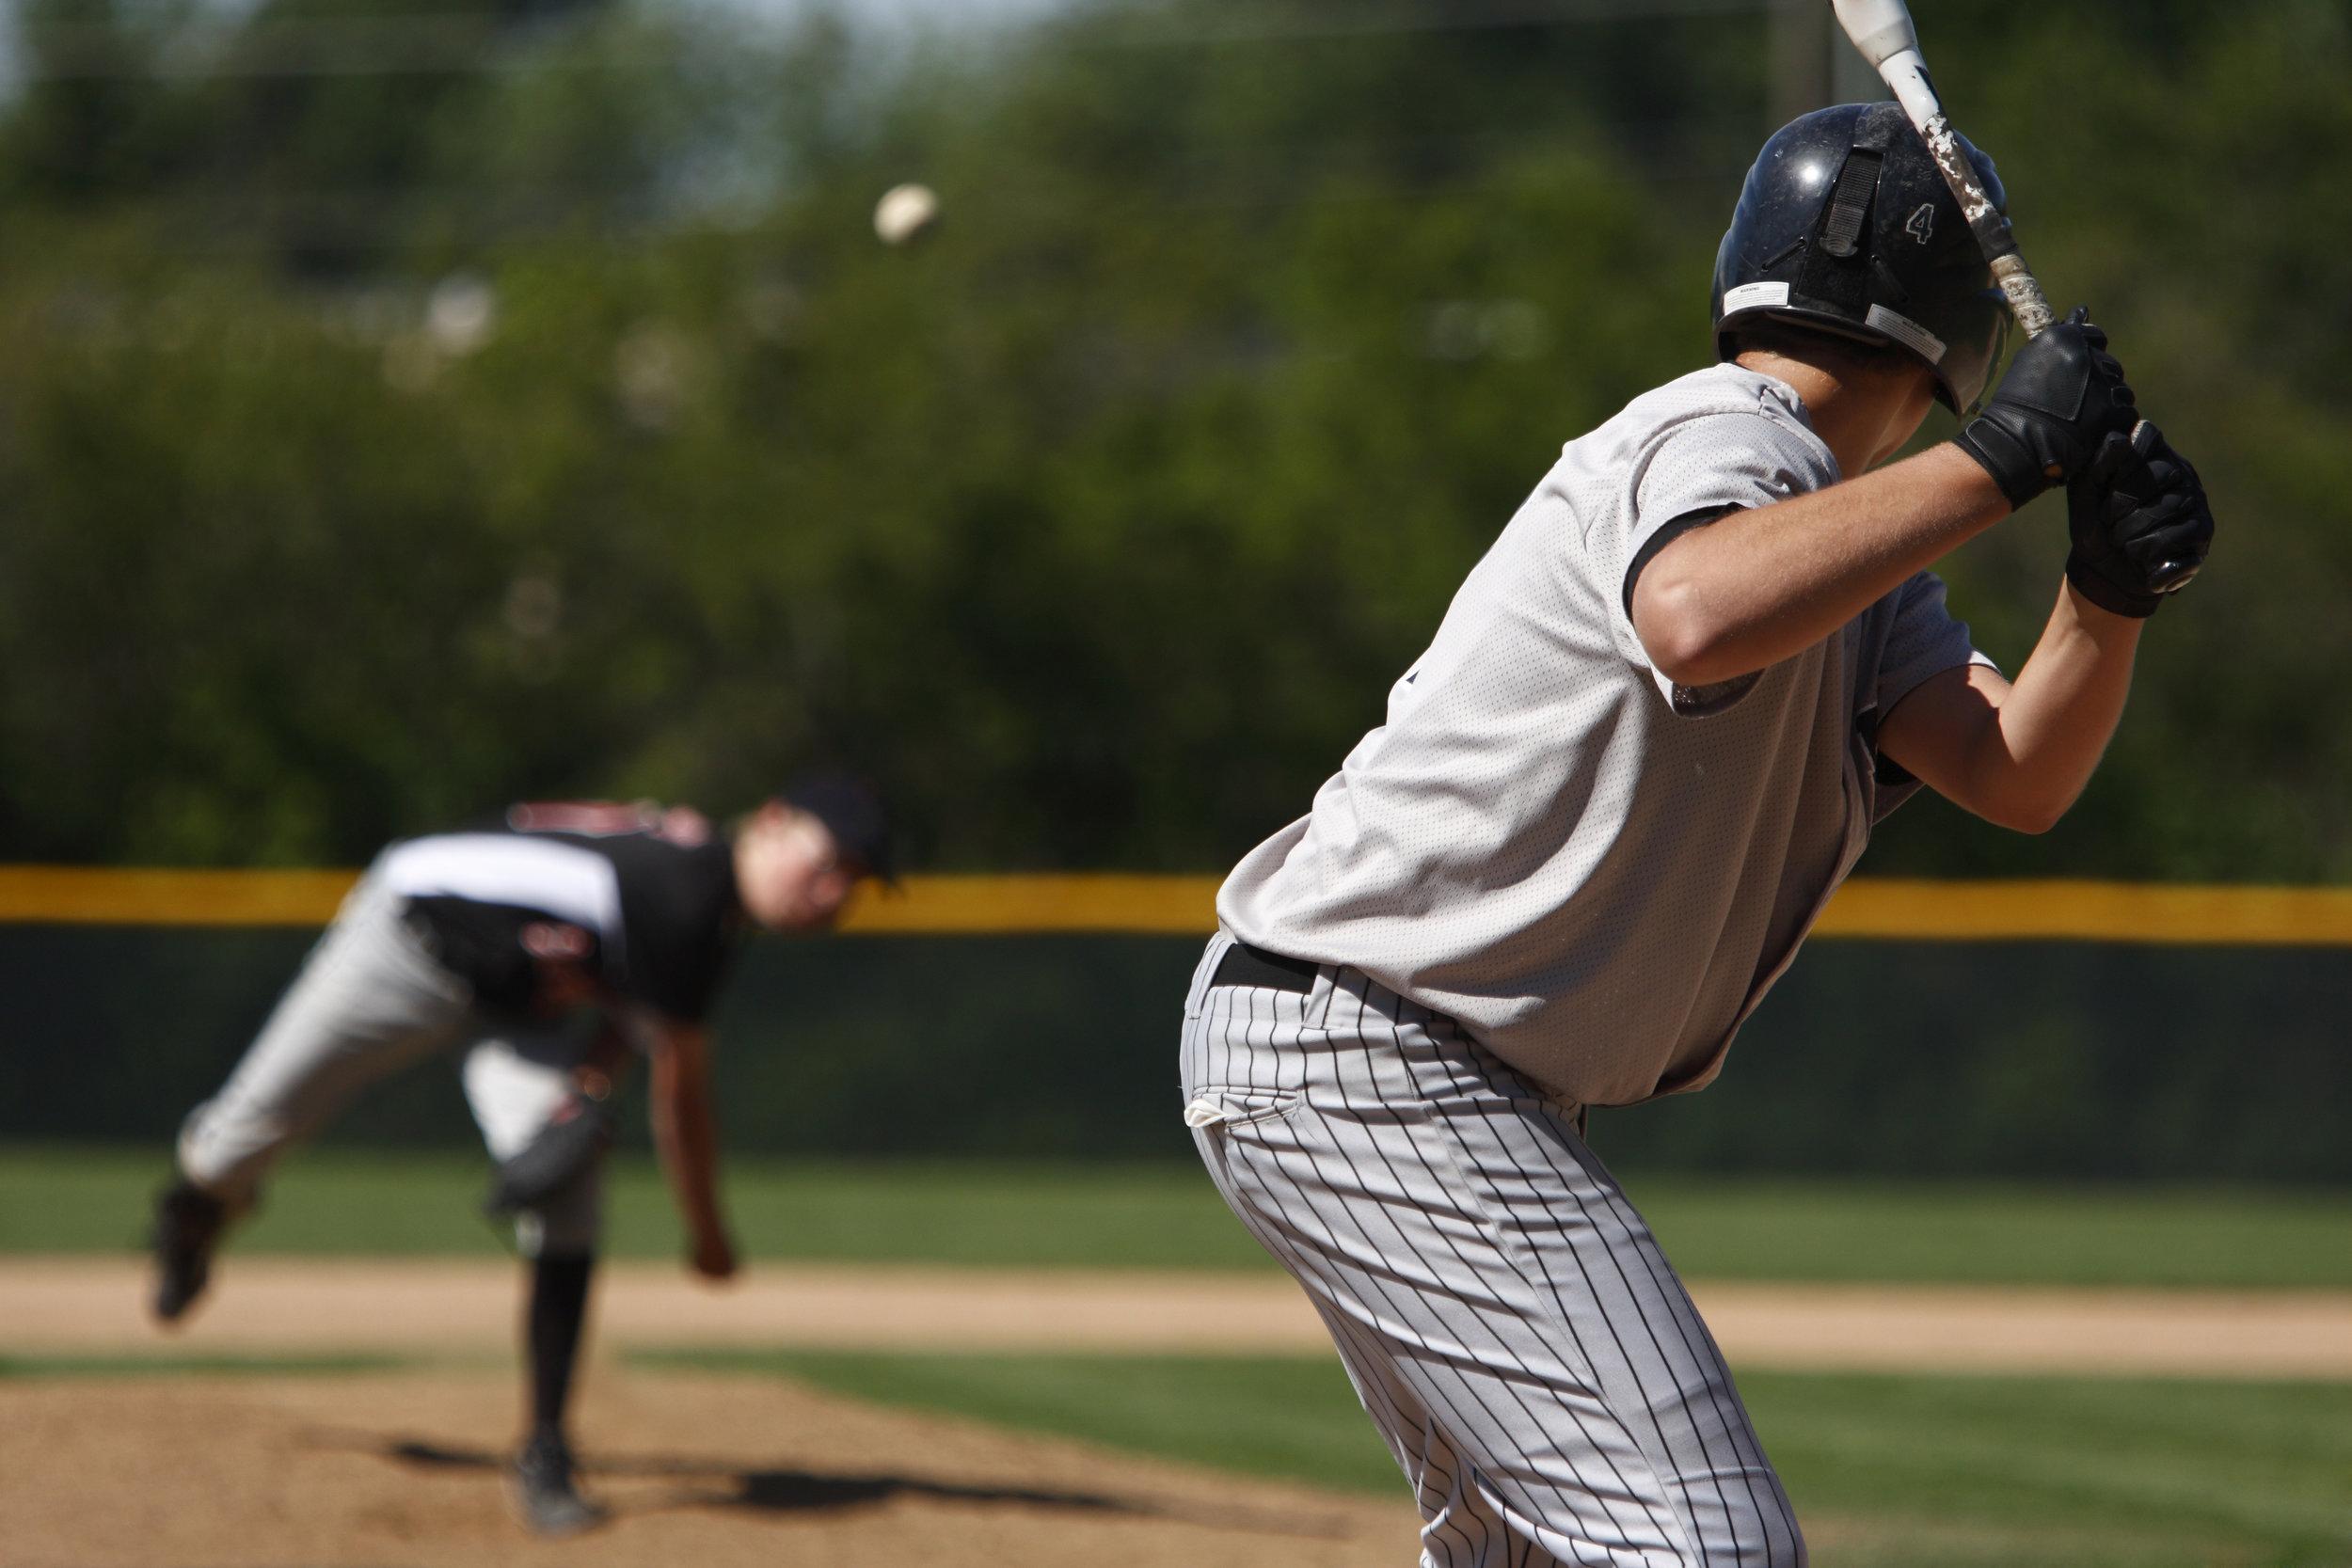 baseball batter watching ball.jpeg